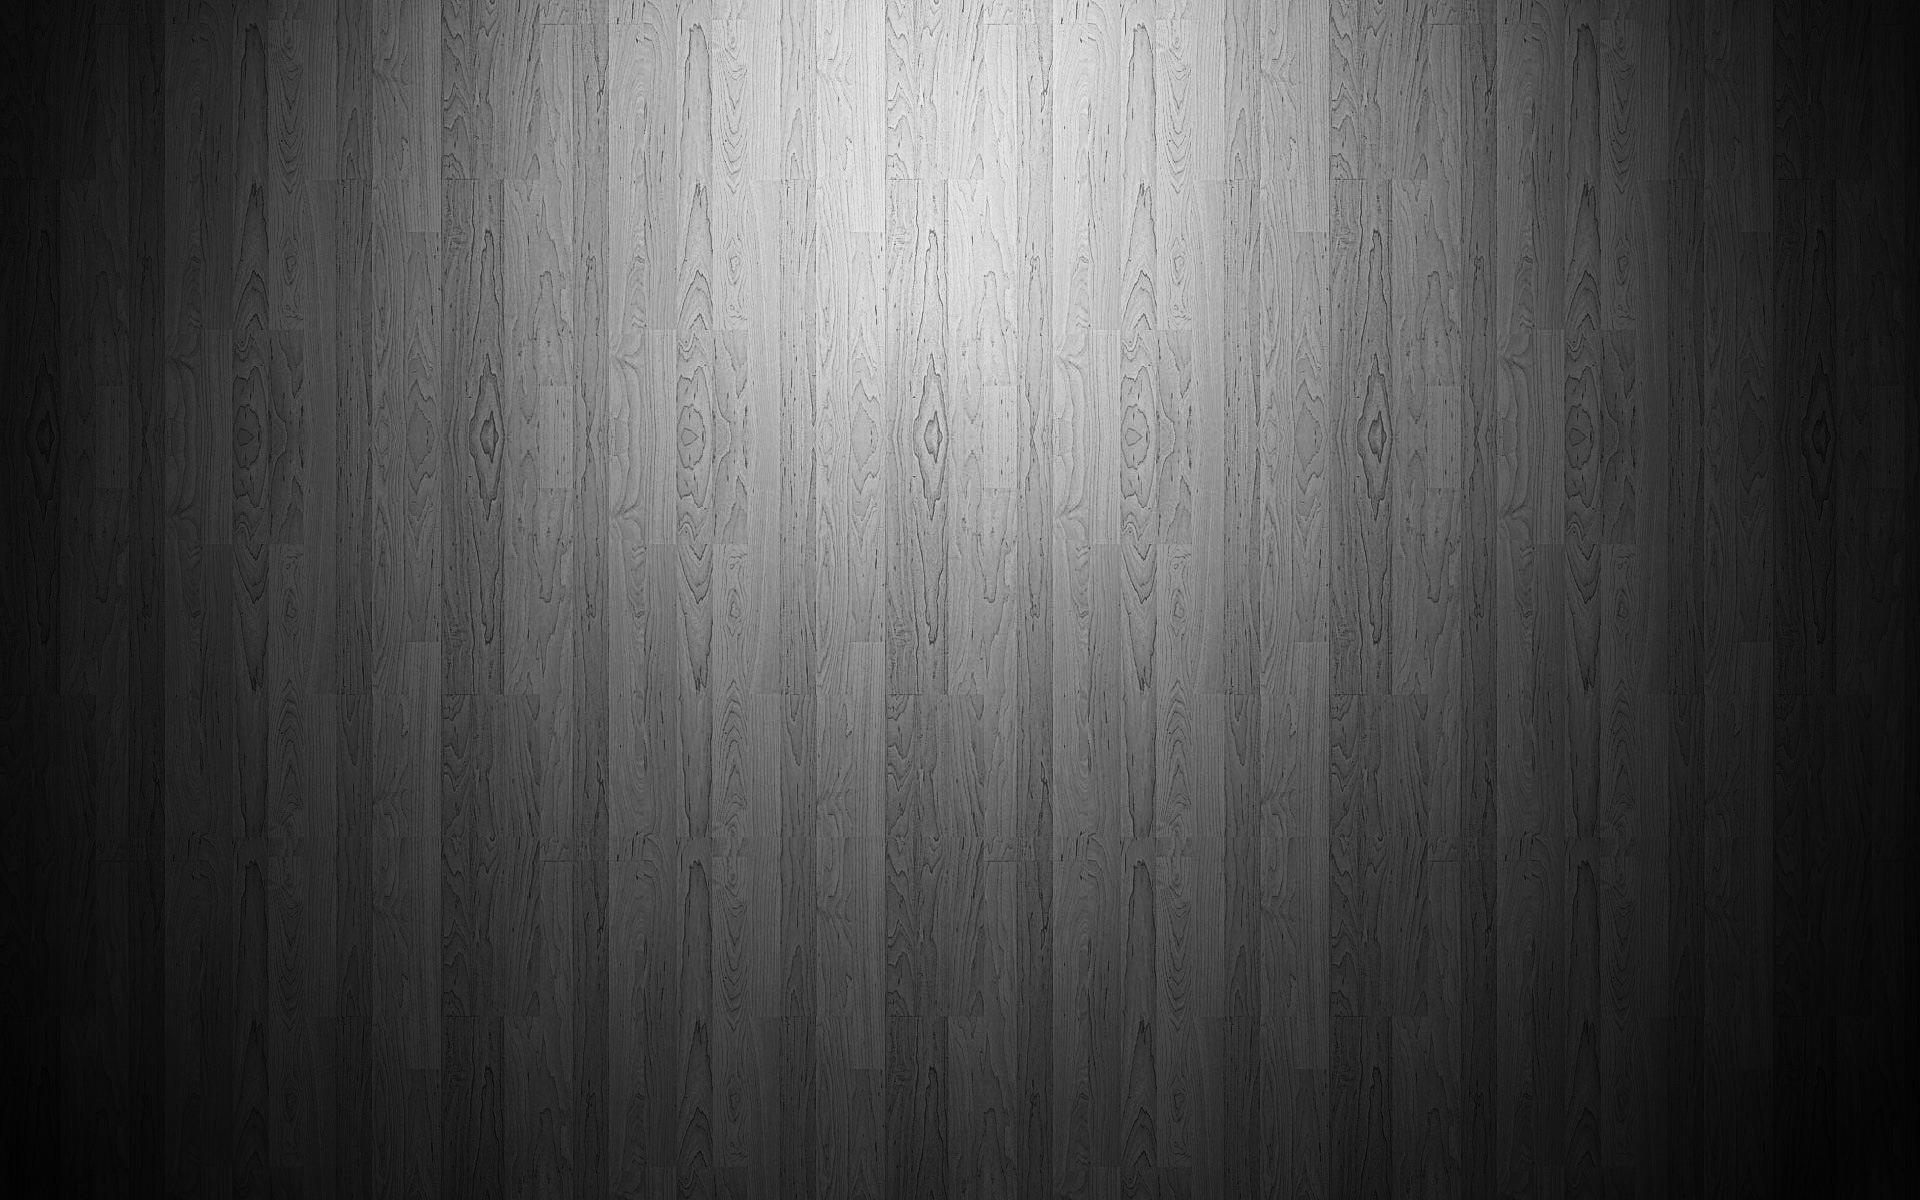 Satanic Iphone Wallpaper Wood Hd Wallpaper Background Image 1920x1200 Id